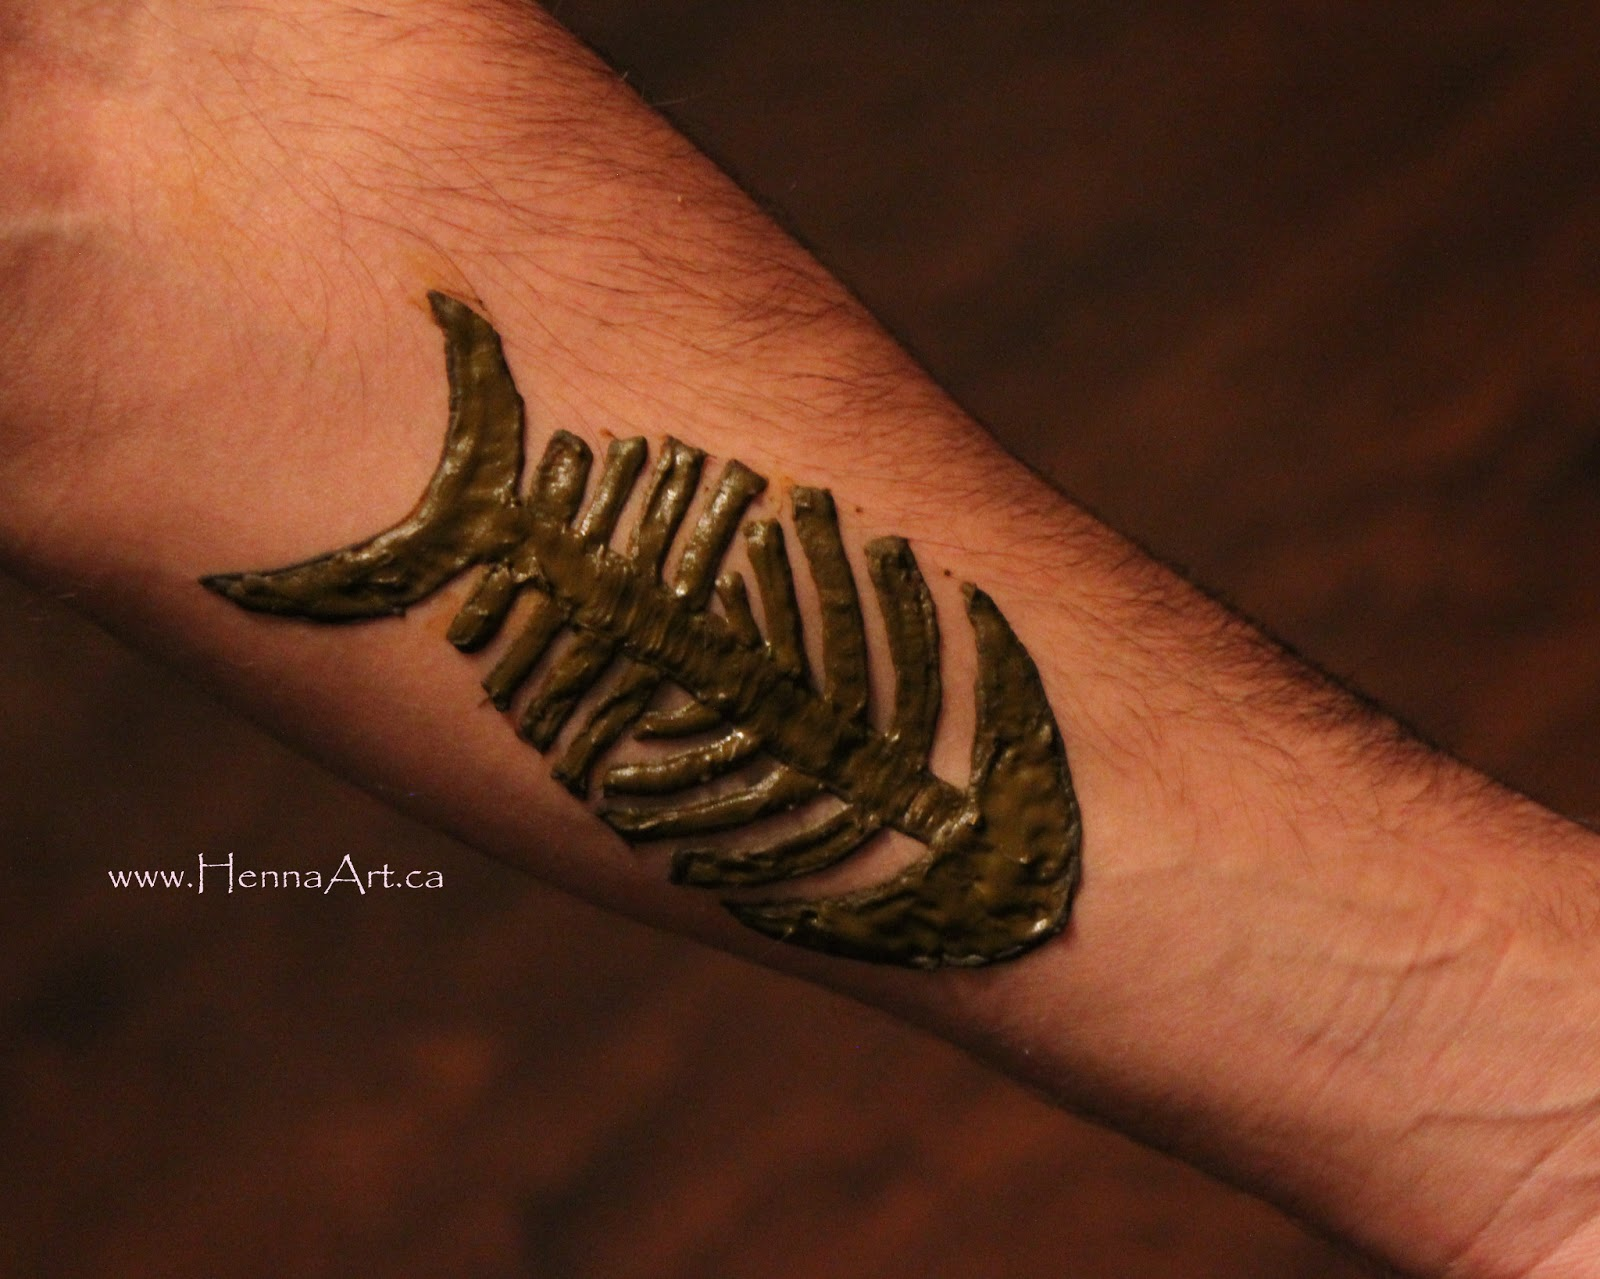 Mehndi Tattoo Designs For Boys : 24 innovative mehndi designs man domseksa.com